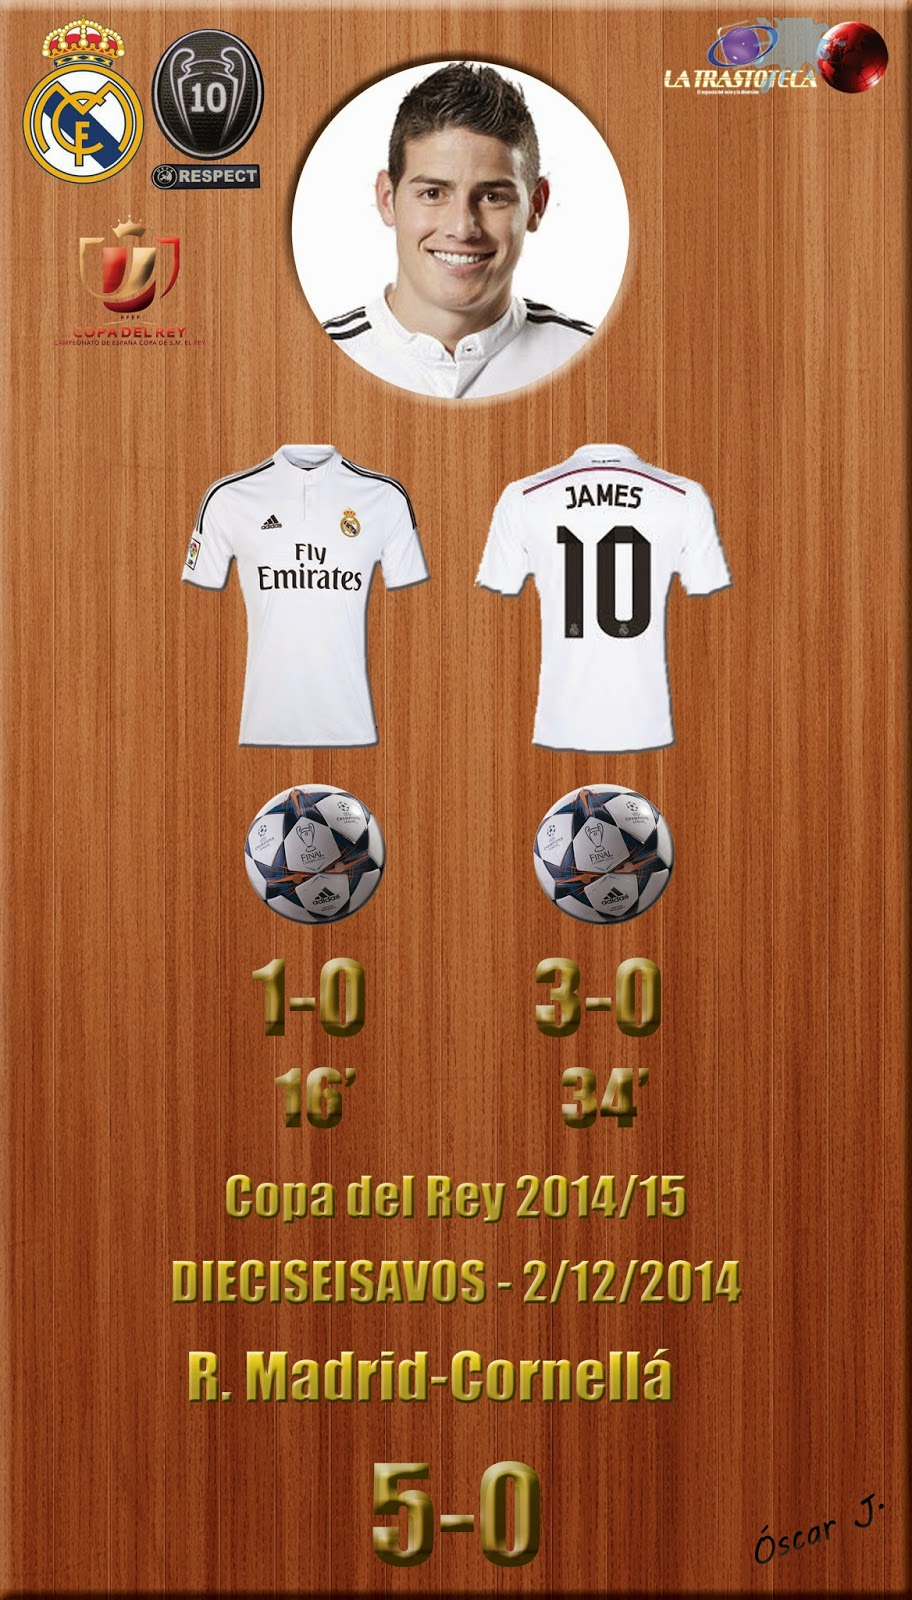 Real Madrid 5-0 Cornellá - Copa del Rey 2014/15 - Dieciseisavos - (2/12/2014)